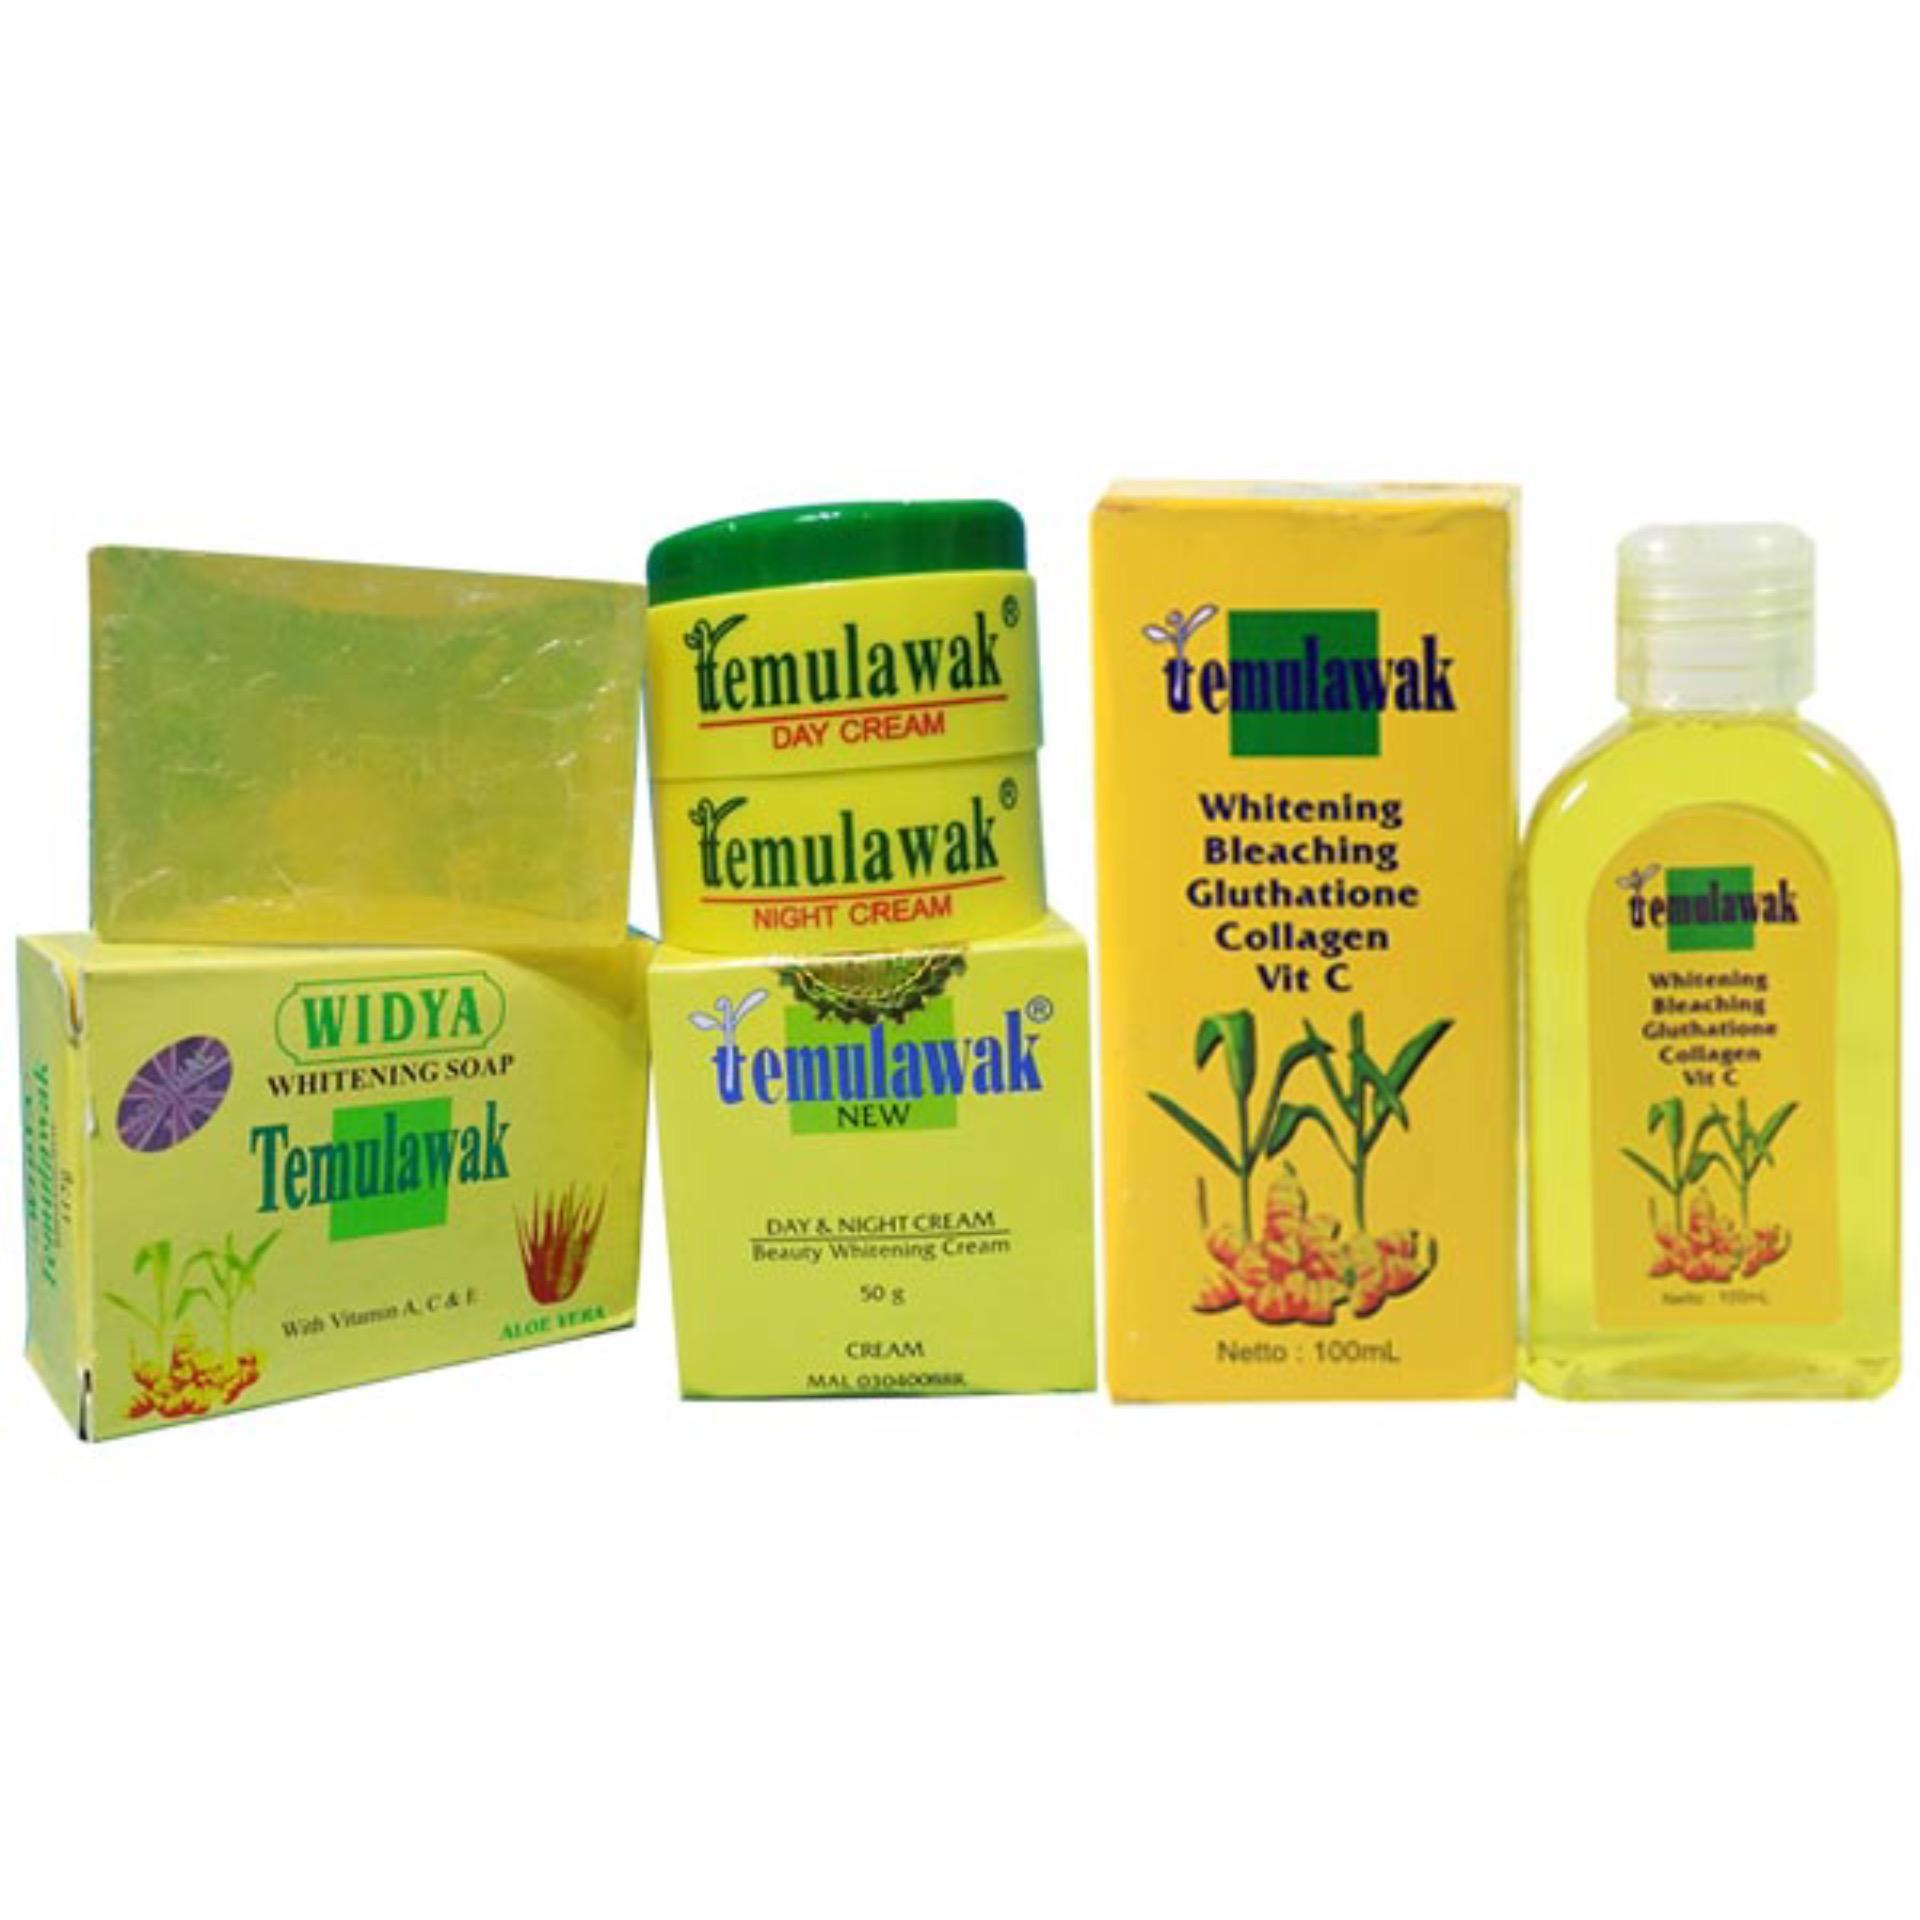 Best Price Paket Komplit Cream Temulawak Toner Temulawak Sabun Temulawak Menghilangkan Jerawat Mencerahkan Mengencangkan Wajah -